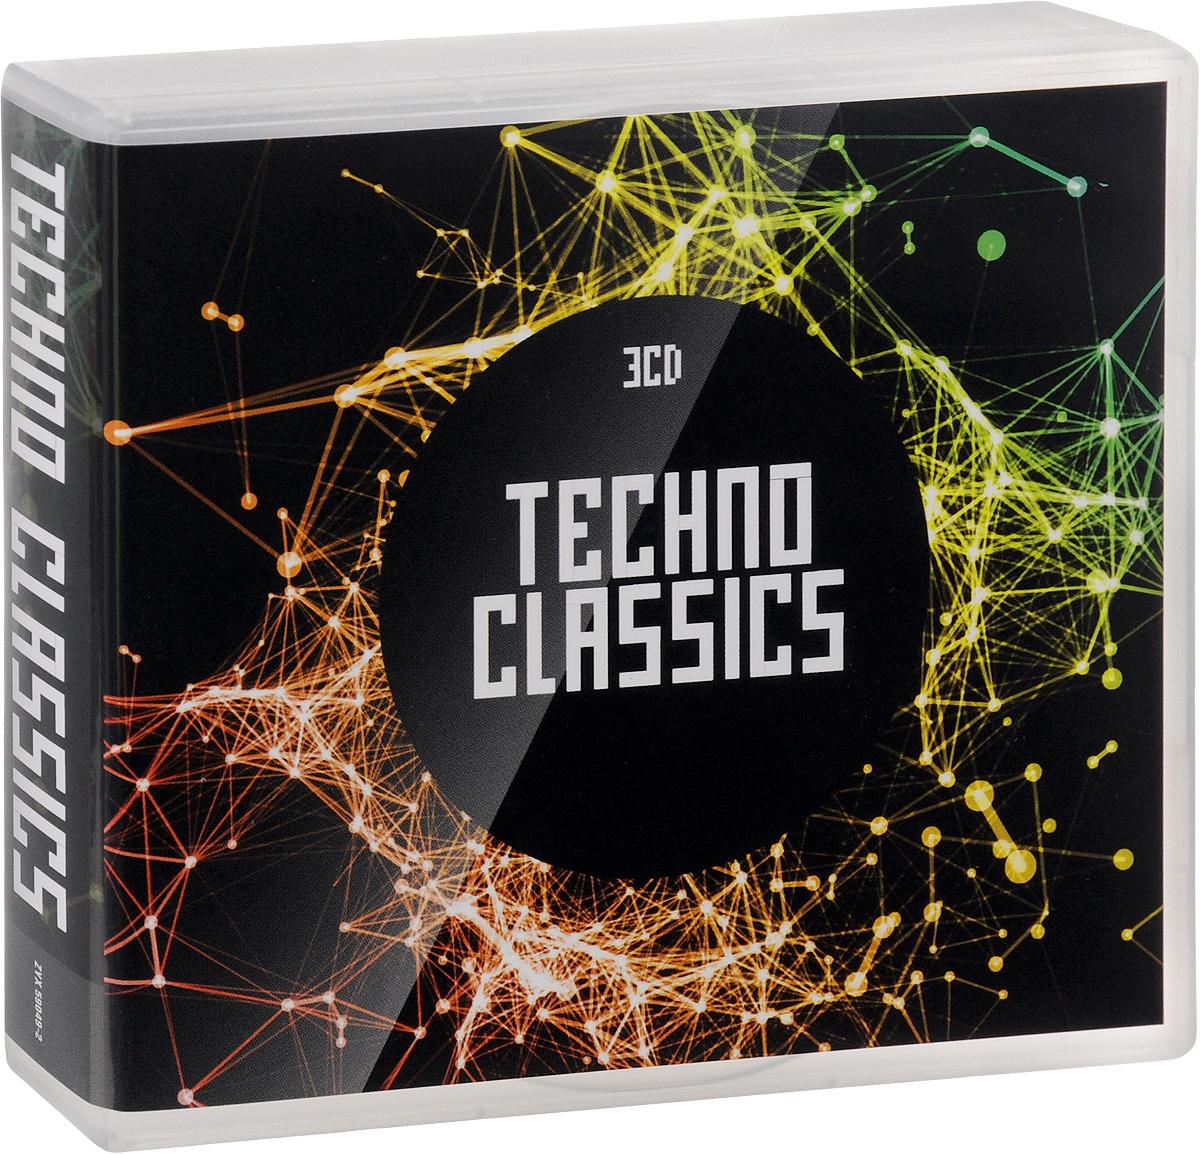 Techno Classics (3 CD) 2016 3 Audio CD